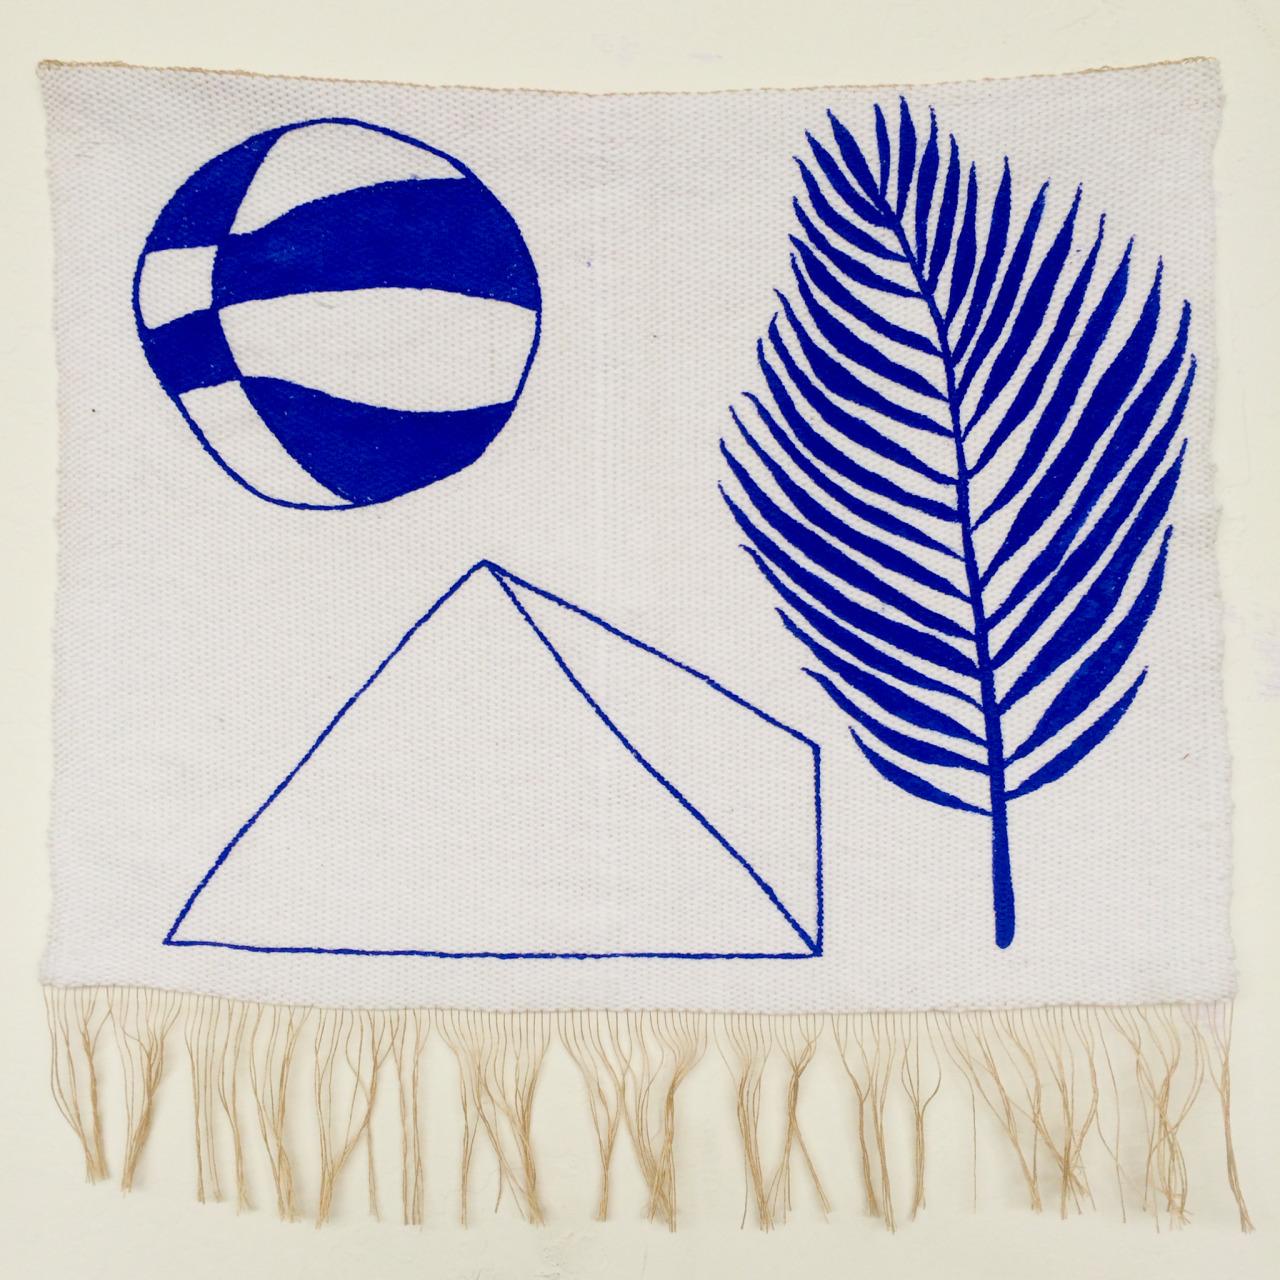 Hanan Sharifa, Ball is Life in Morocco, hand-woven cotton and silk, hand-painted acrylic, 12 x 11.